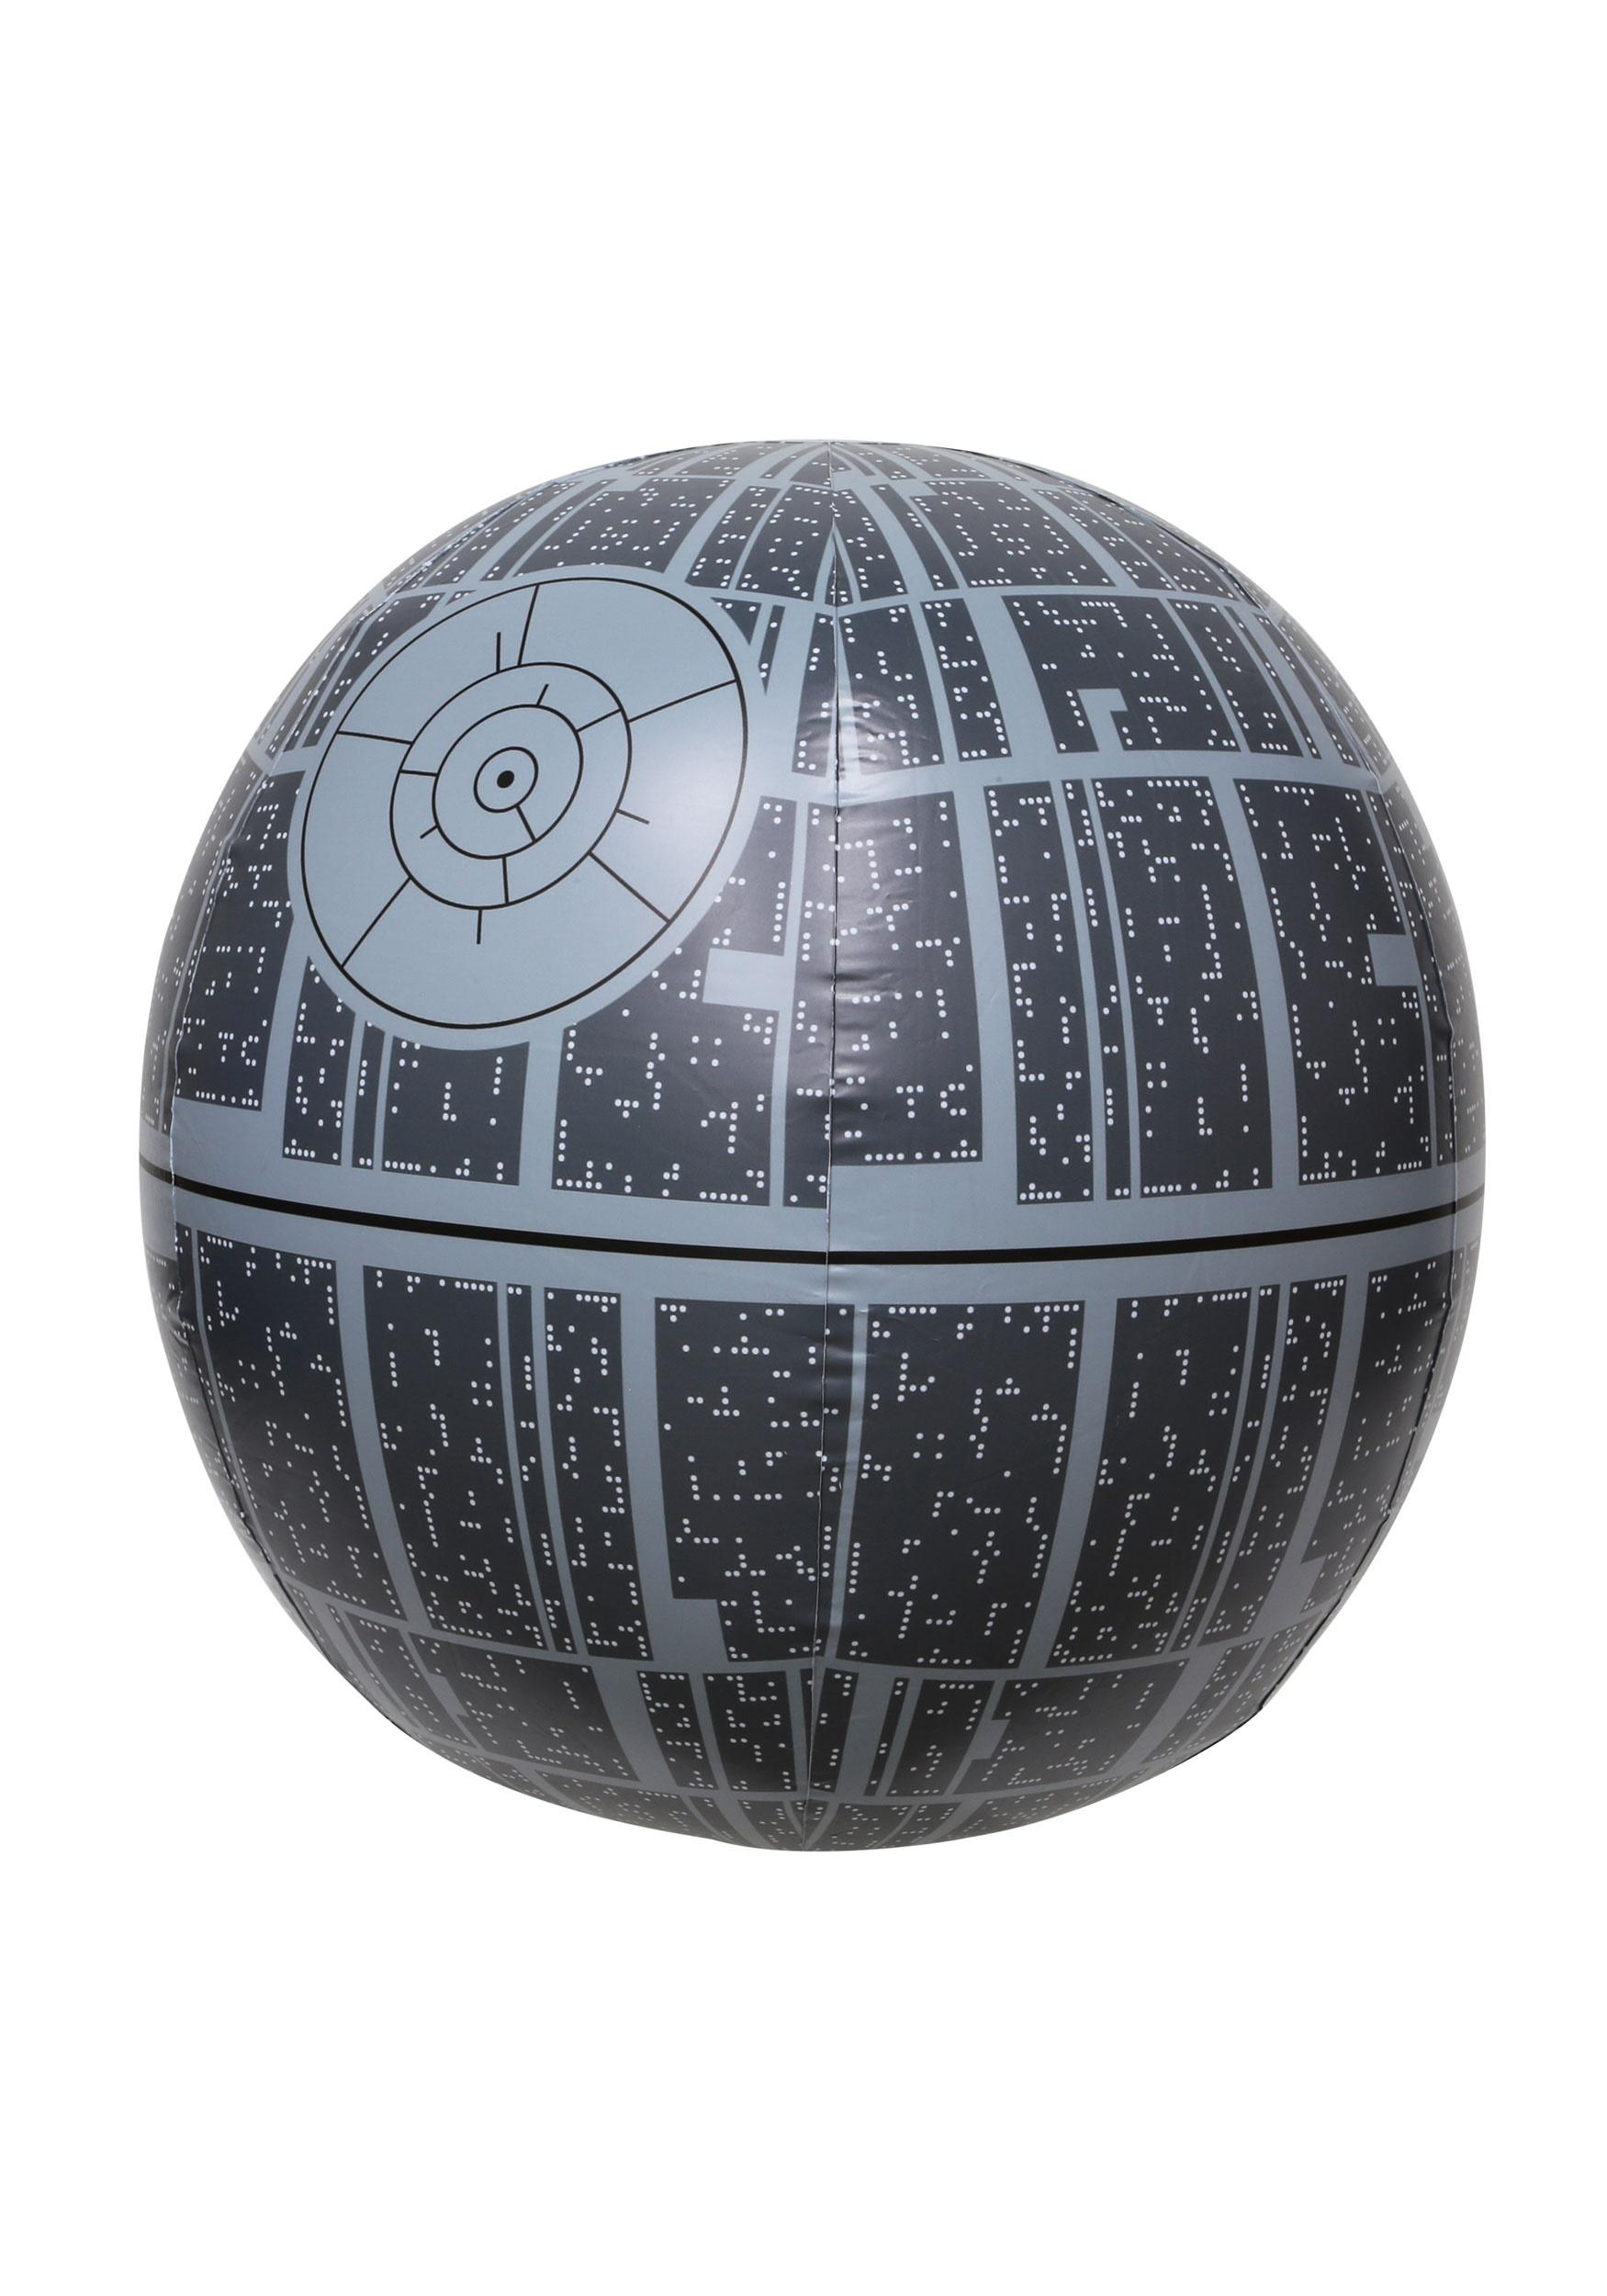 Star Wars Death Star Light-Up Inflatable Beach Ball SWM29002